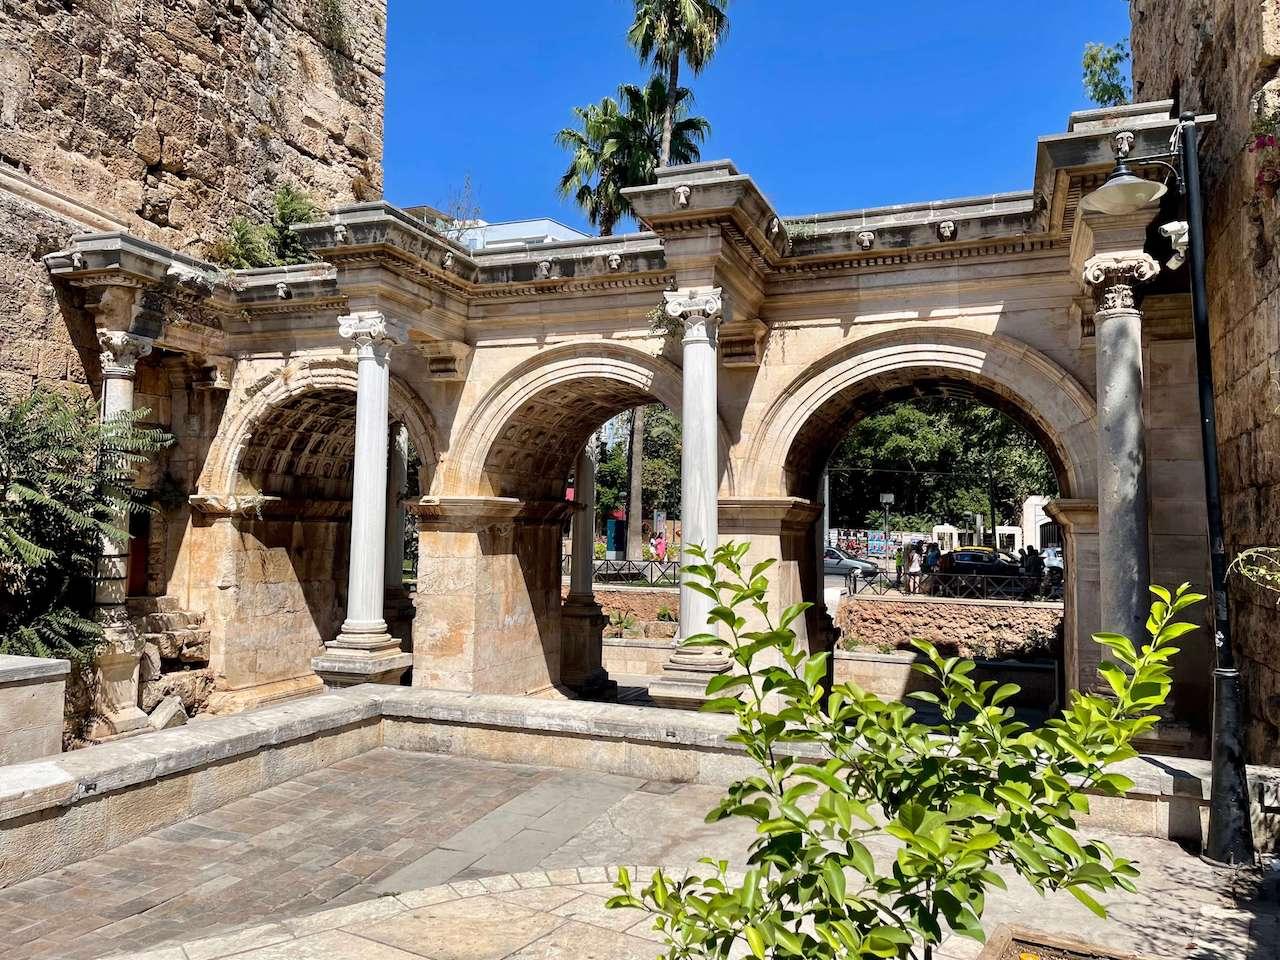 Turkey, Antalya - Hadrian's Gate